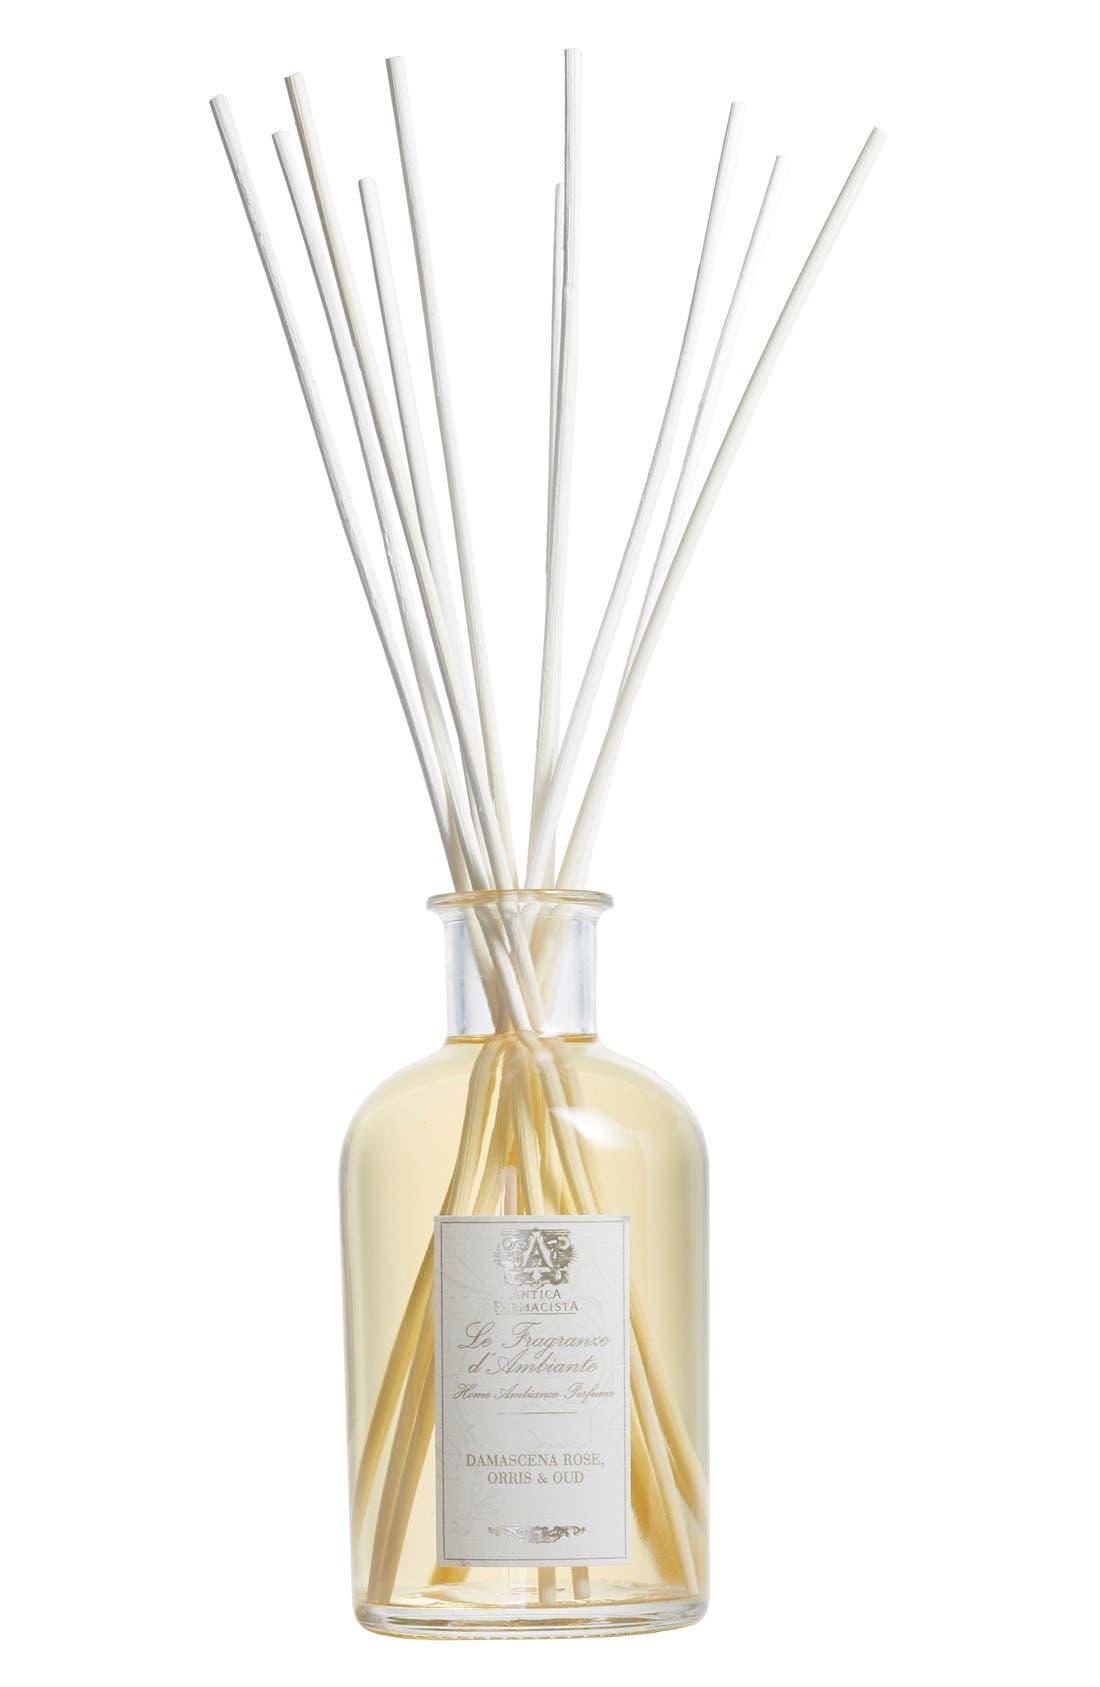 Alternate Image 1 Selected - Antica Farmacista Damascena Rose, Orris & Oud Home Ambiance Perfume